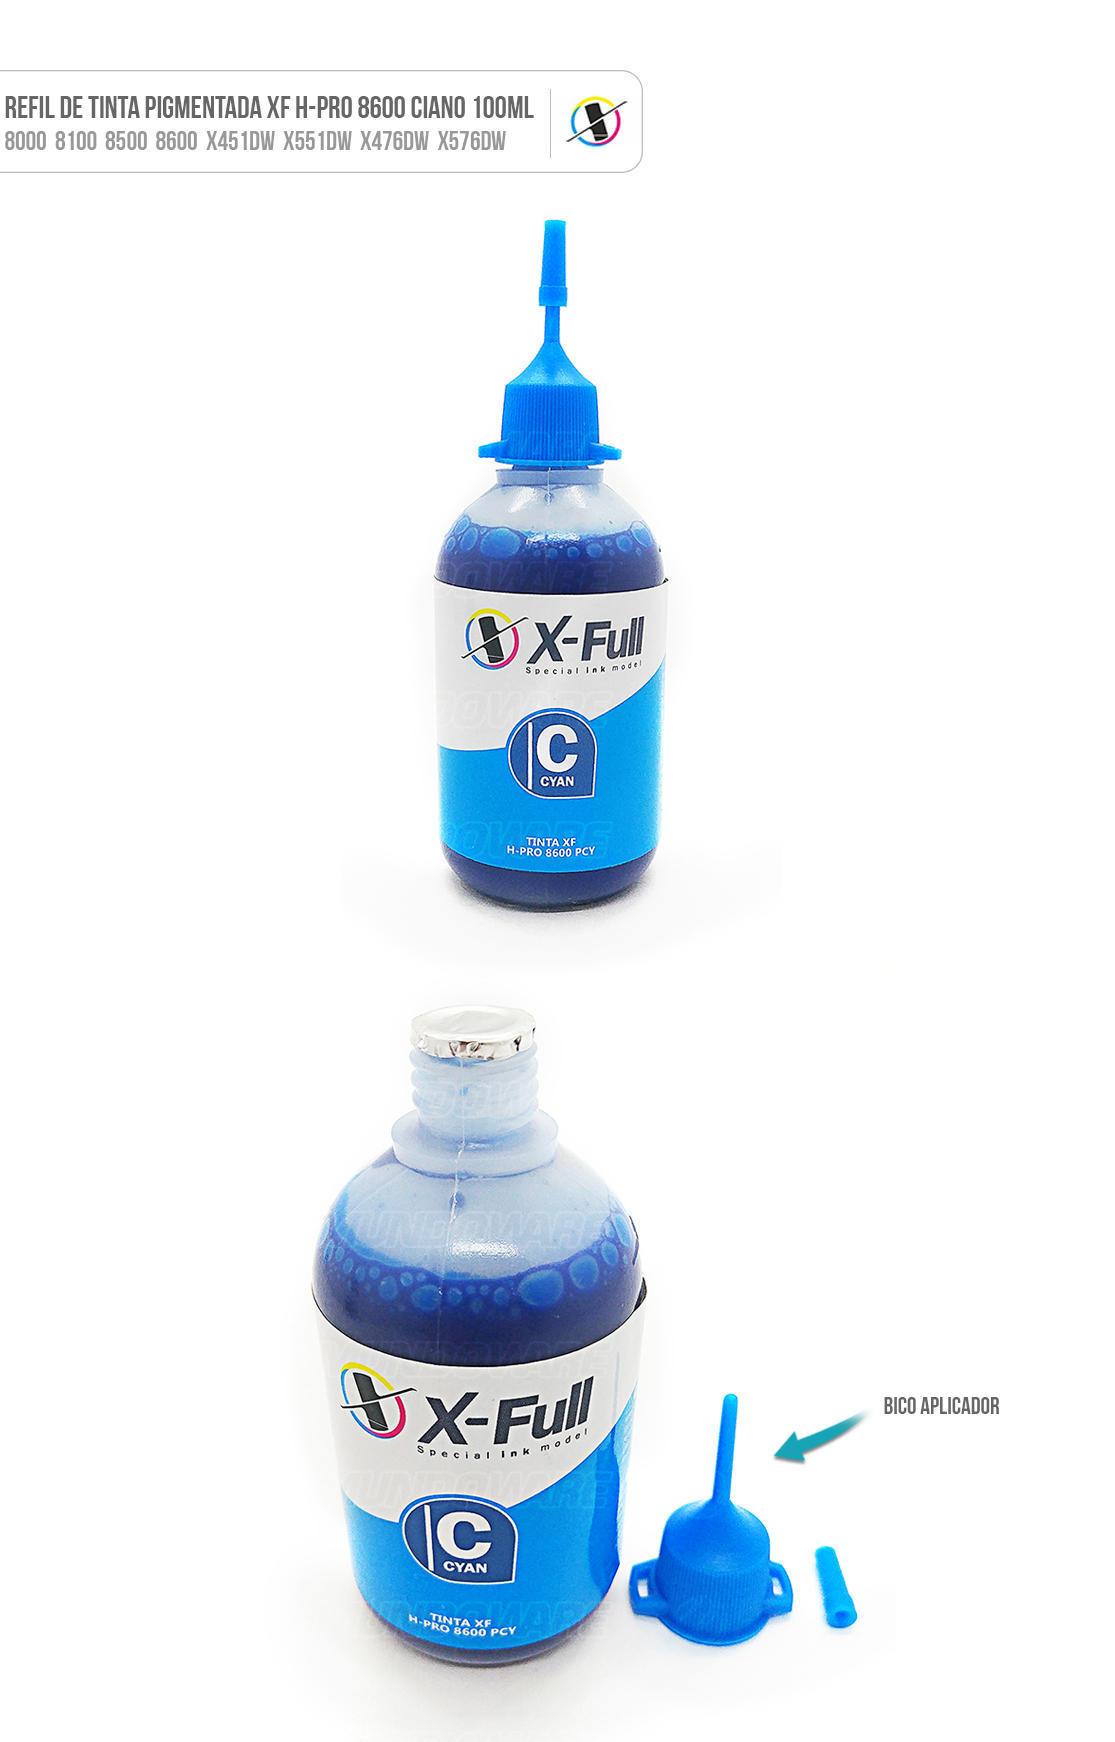 Tinta Ciano Pigmentada para Bulk-ink Tanque de Tinta impressora 8000 8100 8500 8600 X451dw X551dw X476dw X576dw